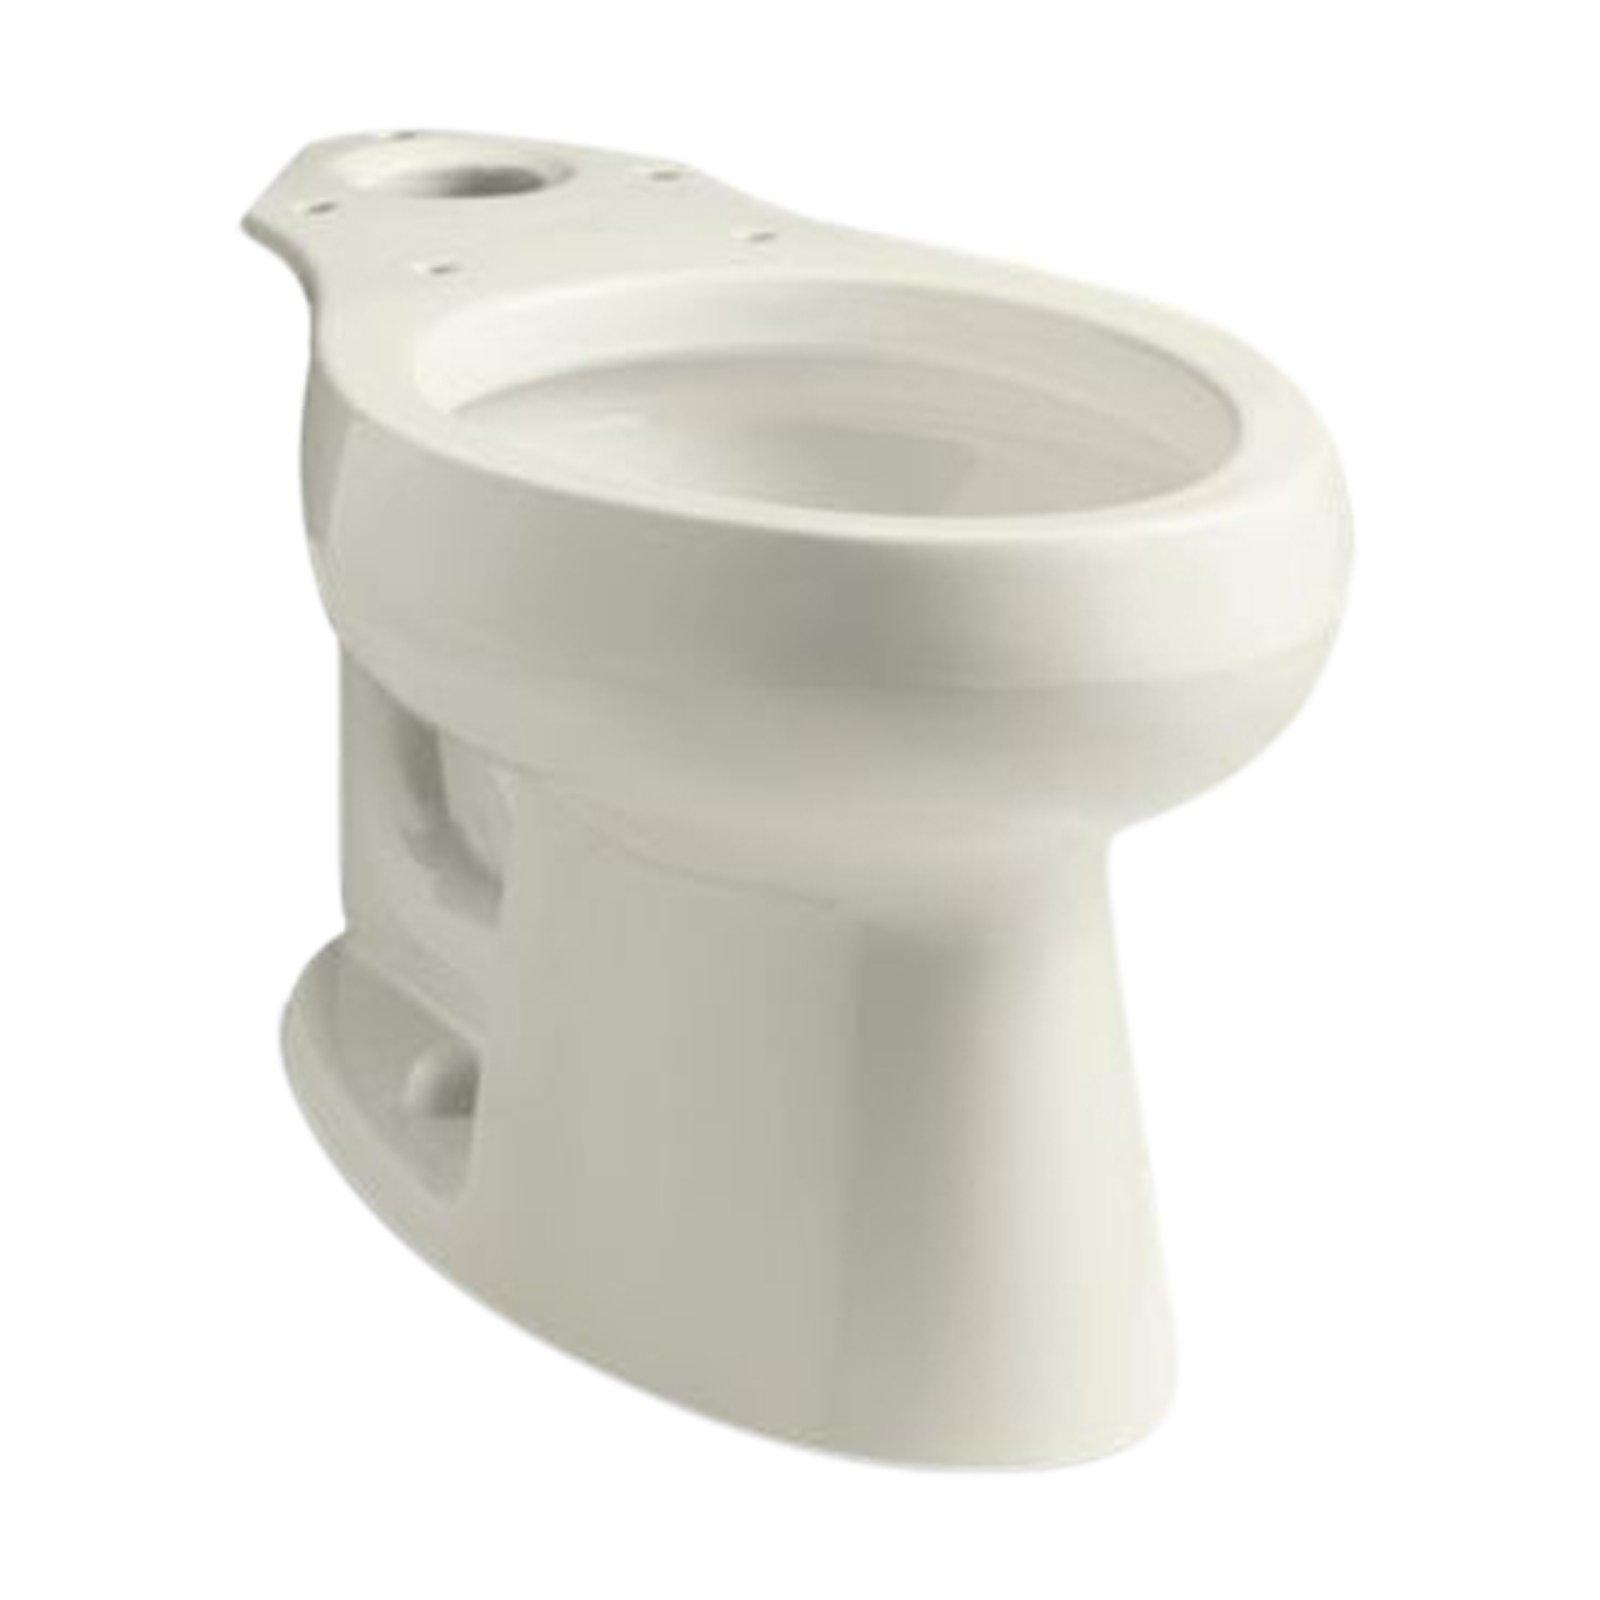 Kohler Wellworth Elongated Toilet Bowl Biscuit Toilet Bowl